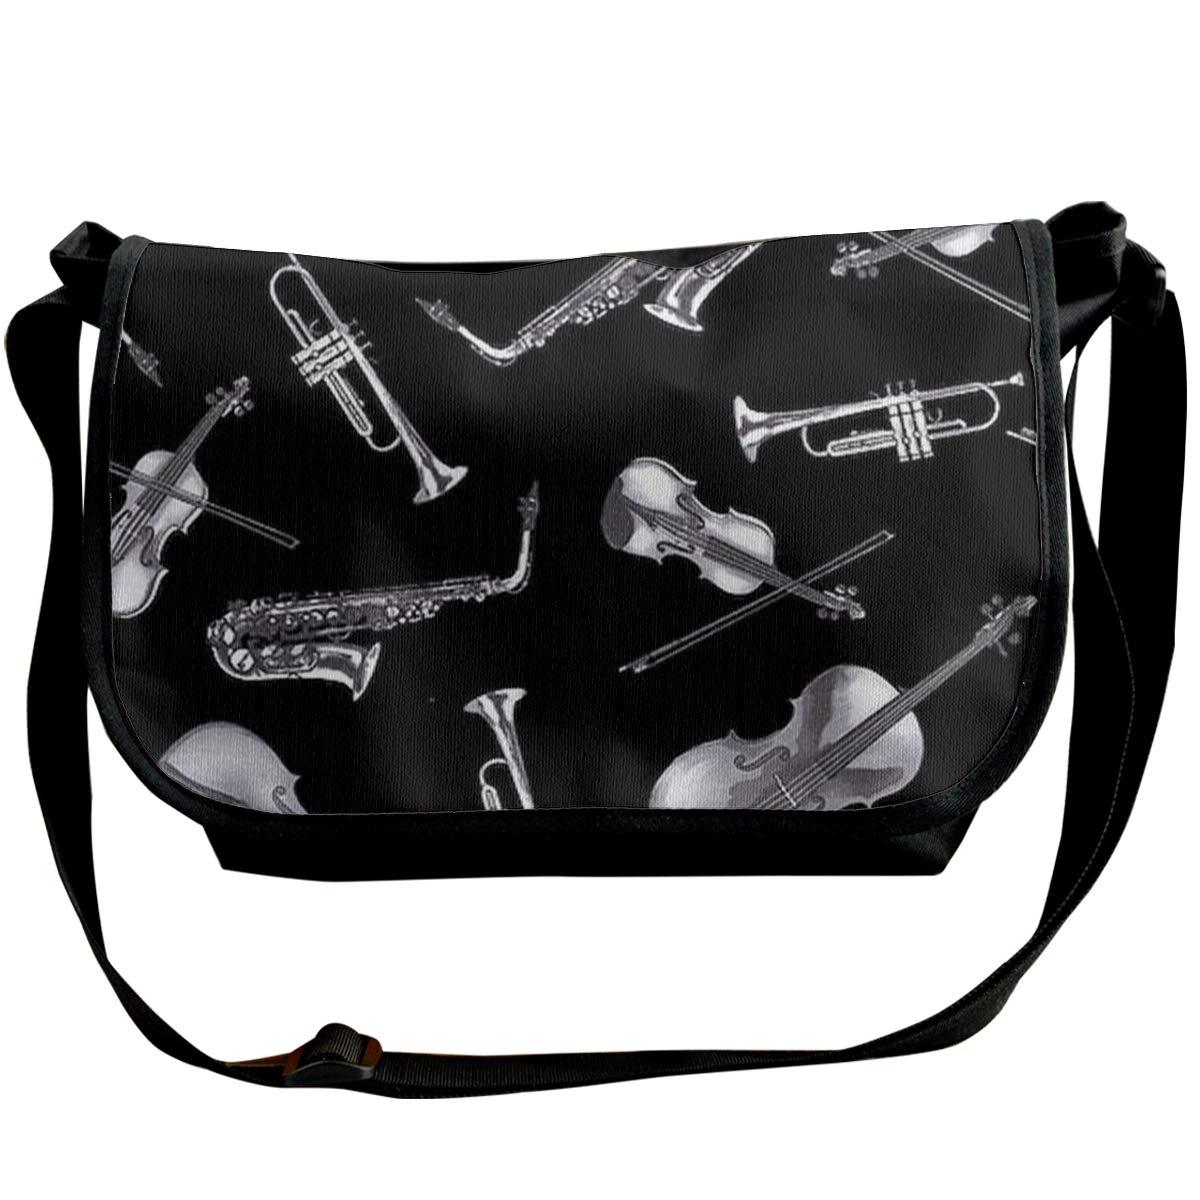 Futong Huaxia Cool Saxophone Background Travel Messenger Bags Handbag Shoulder Bag Crossbody Bag Unisex